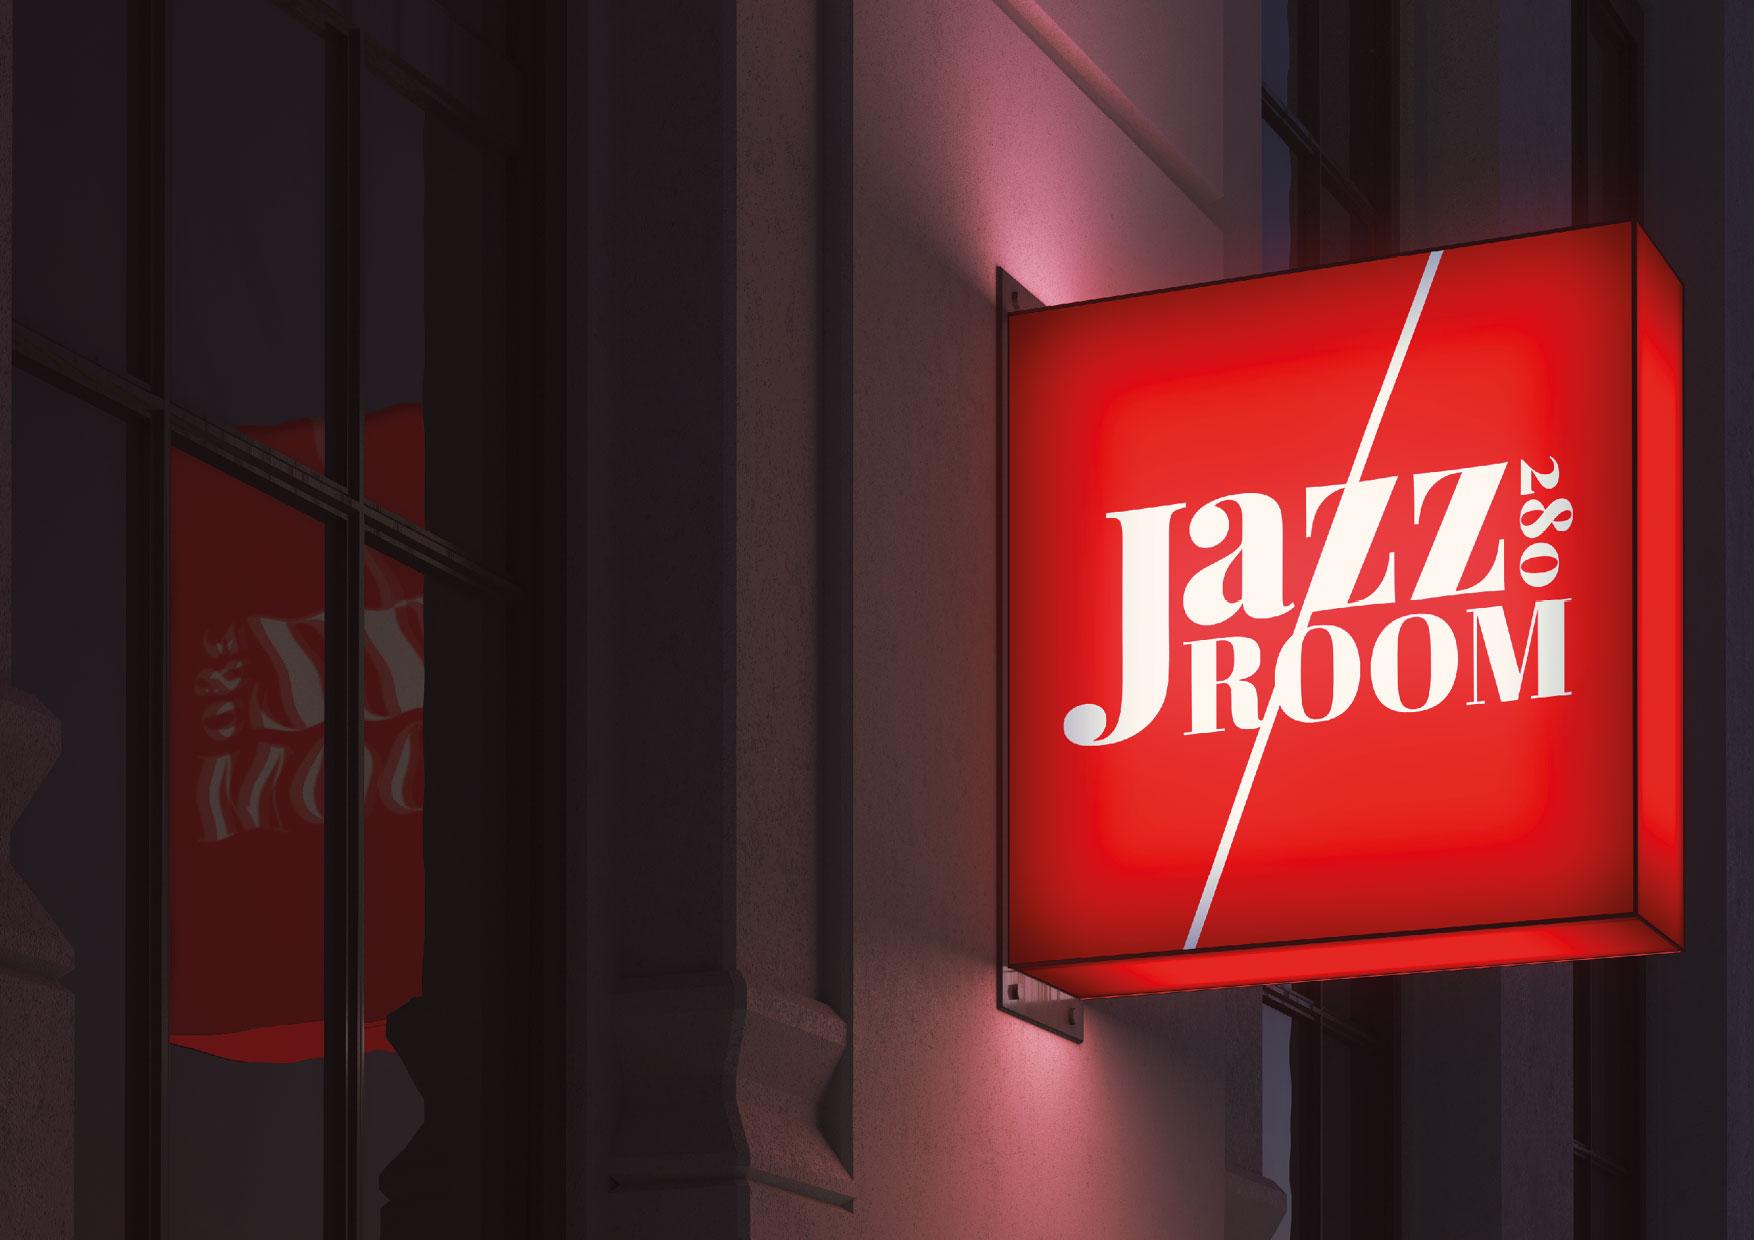 Jazz-Room